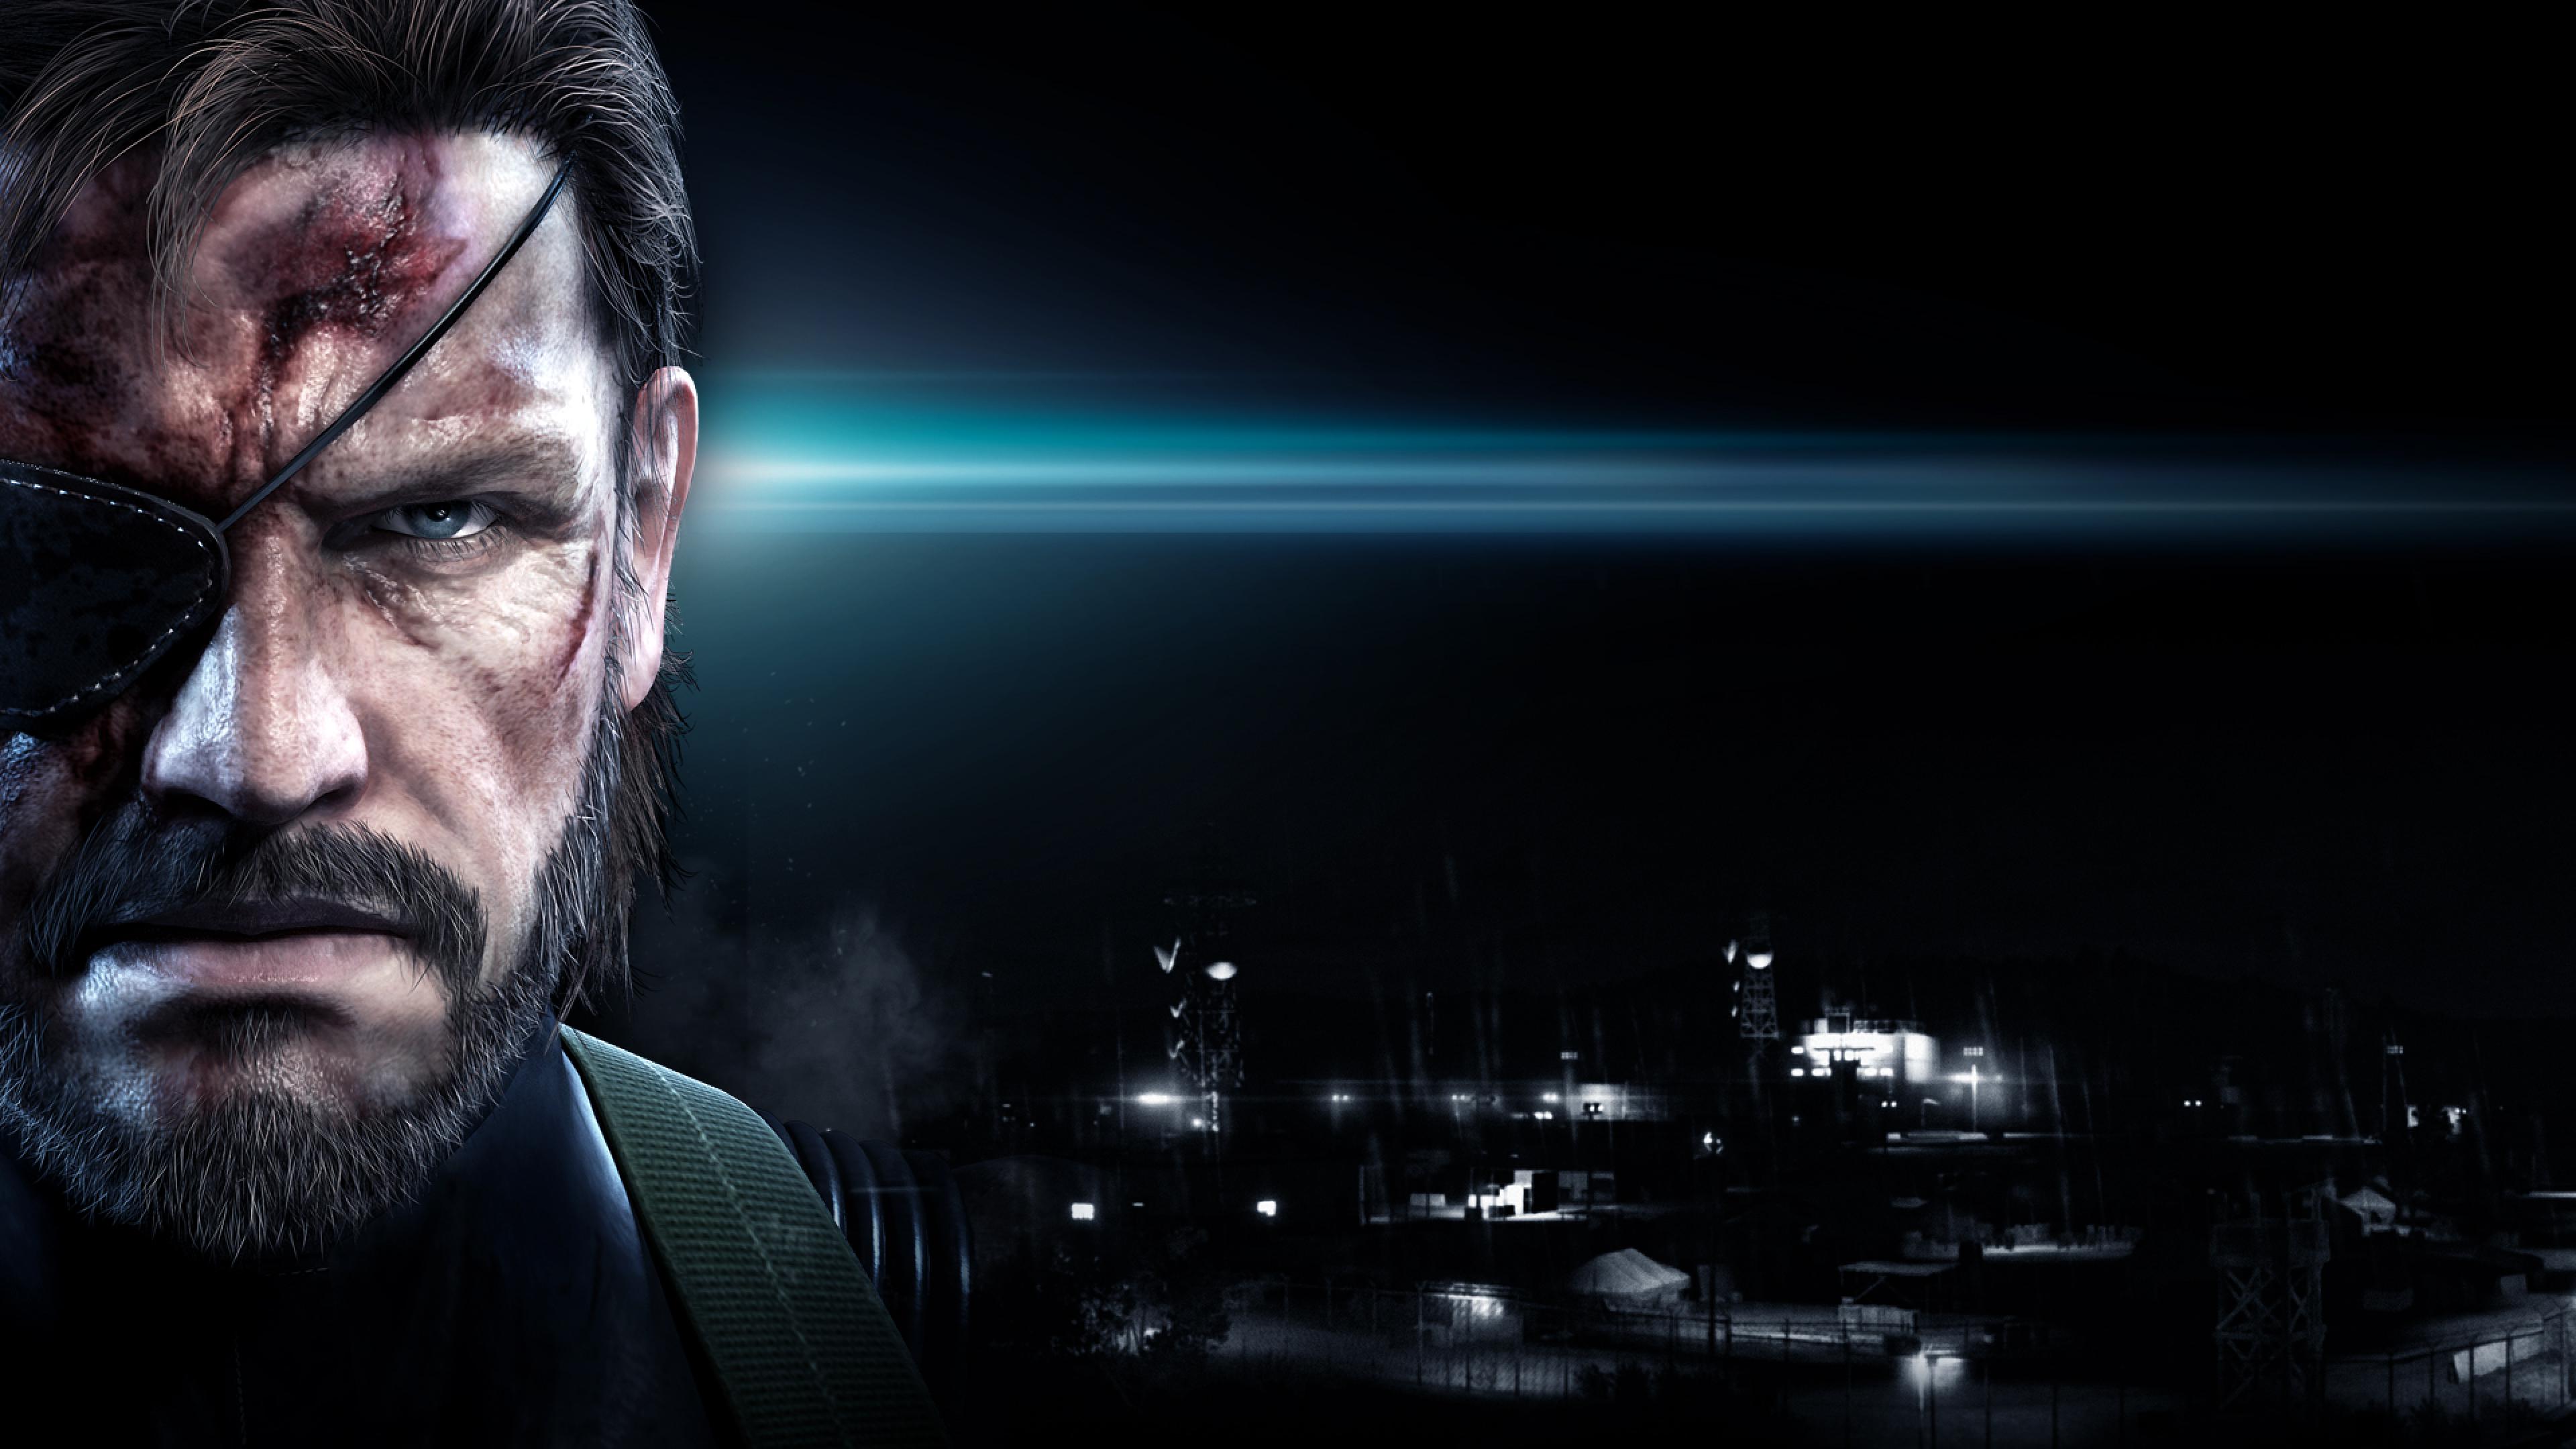 Free Download Metal Gear Solid Big Boss Metal Gear Solid V Ground